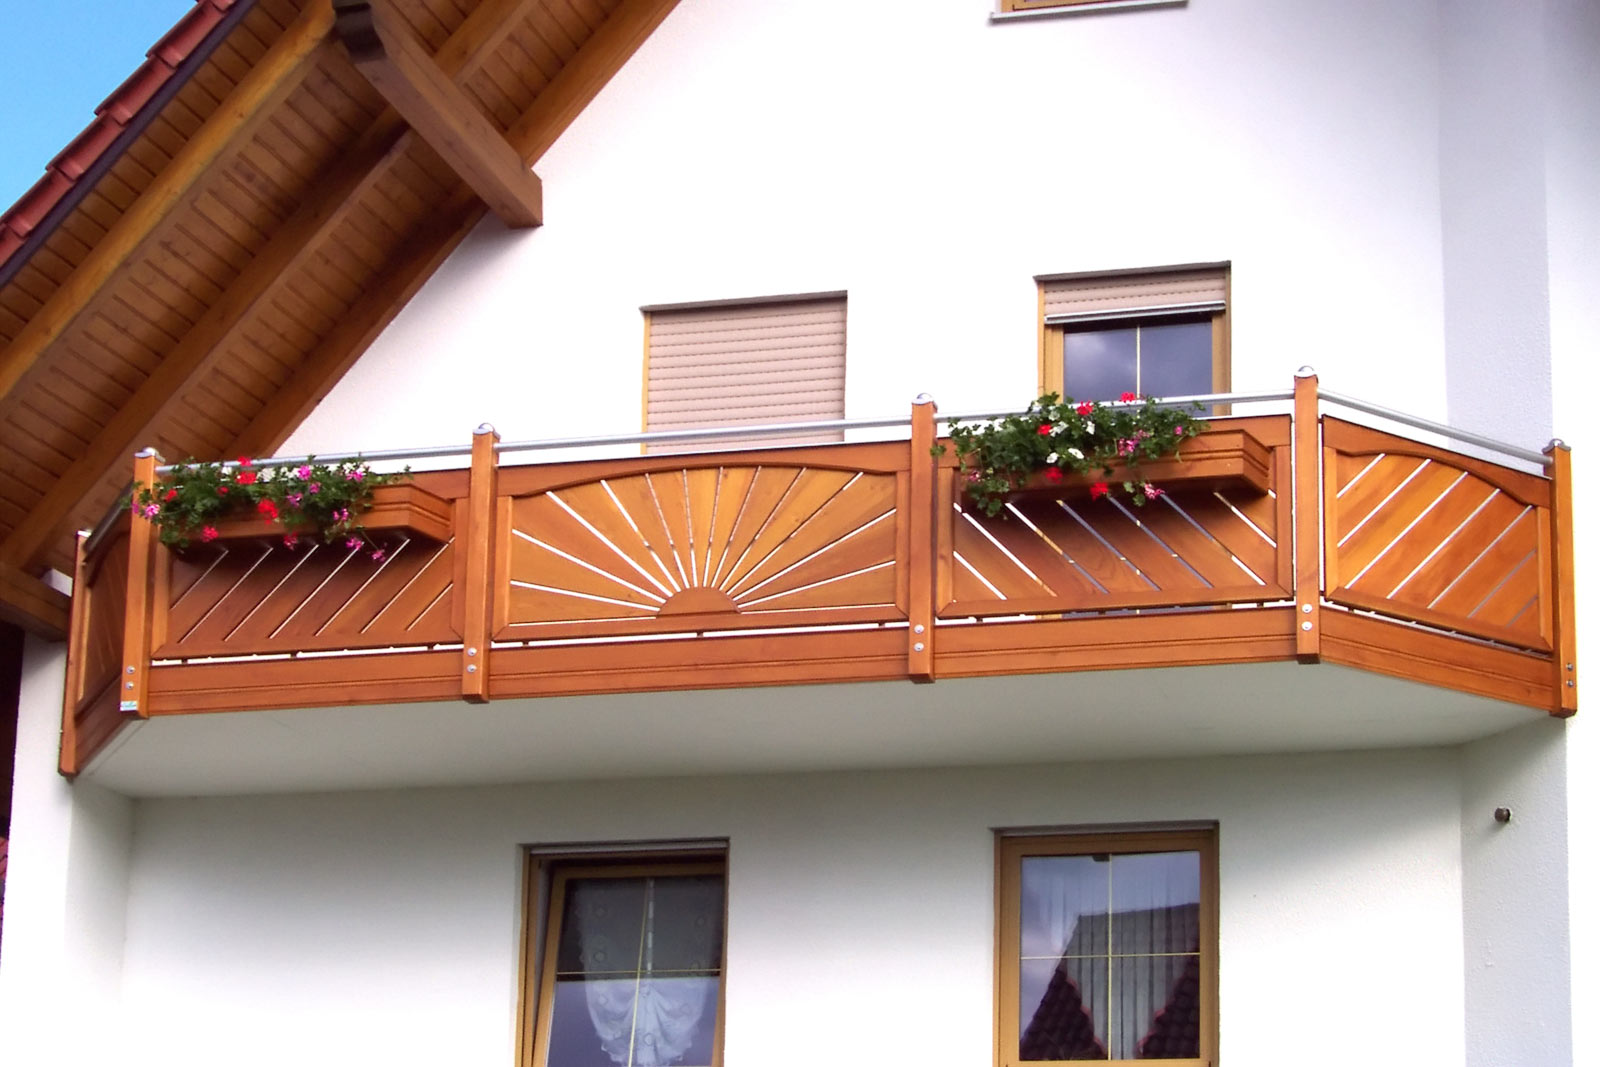 linder balkone z une alu alubalkone alu balkonanbauten alu berdachungen holz liba alu system. Black Bedroom Furniture Sets. Home Design Ideas